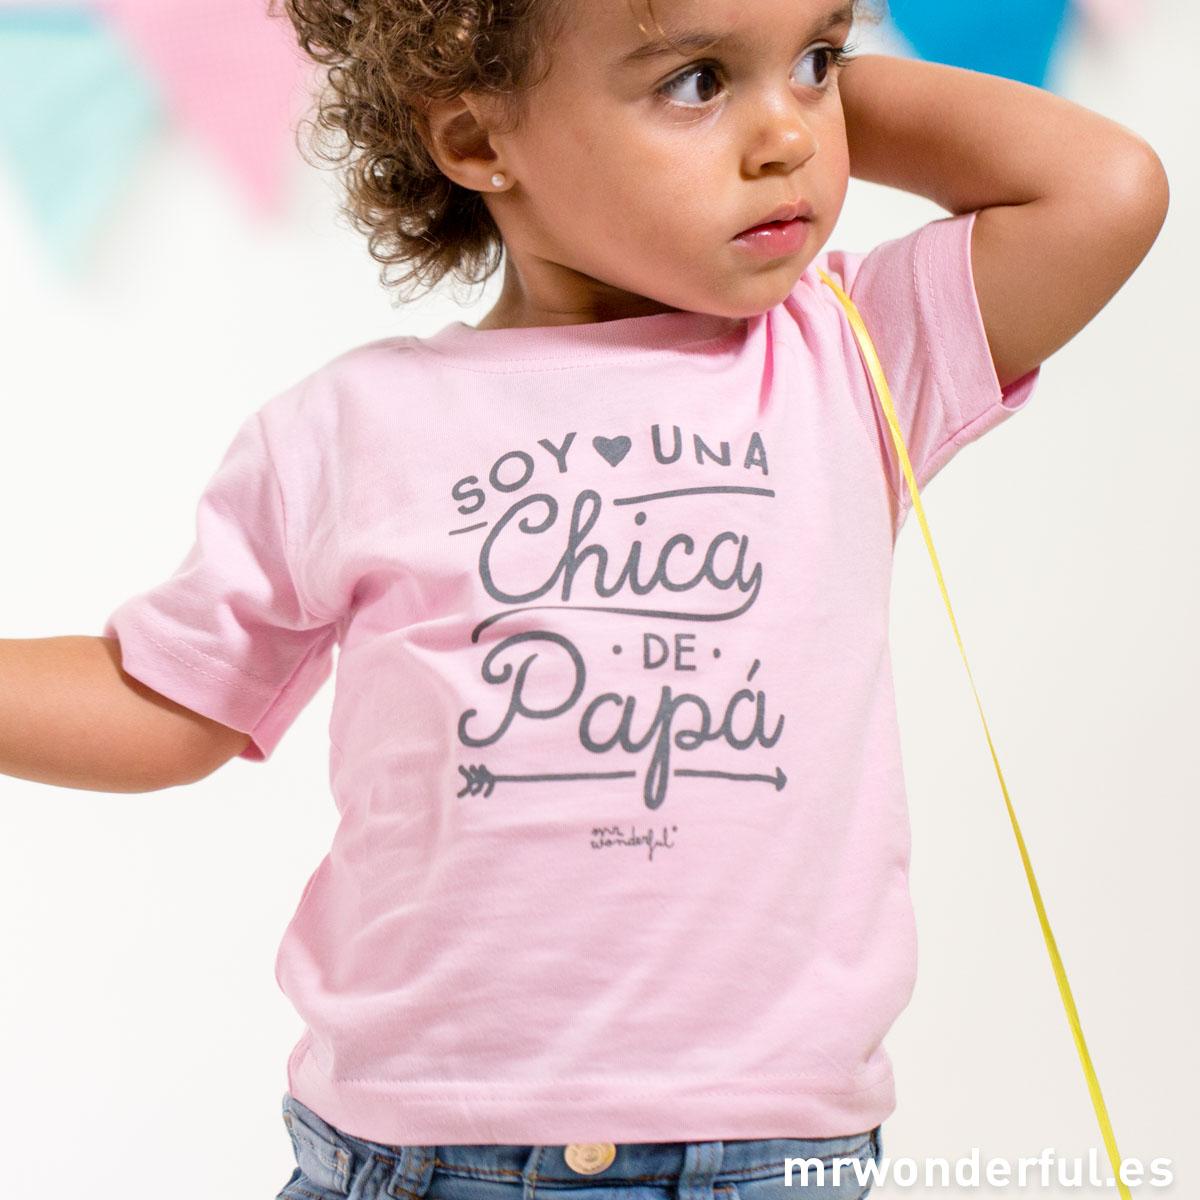 mrwonderful_8436547191031_CAMIS_004_Camiseta-nino-Soy-una-chica-de-papa-51